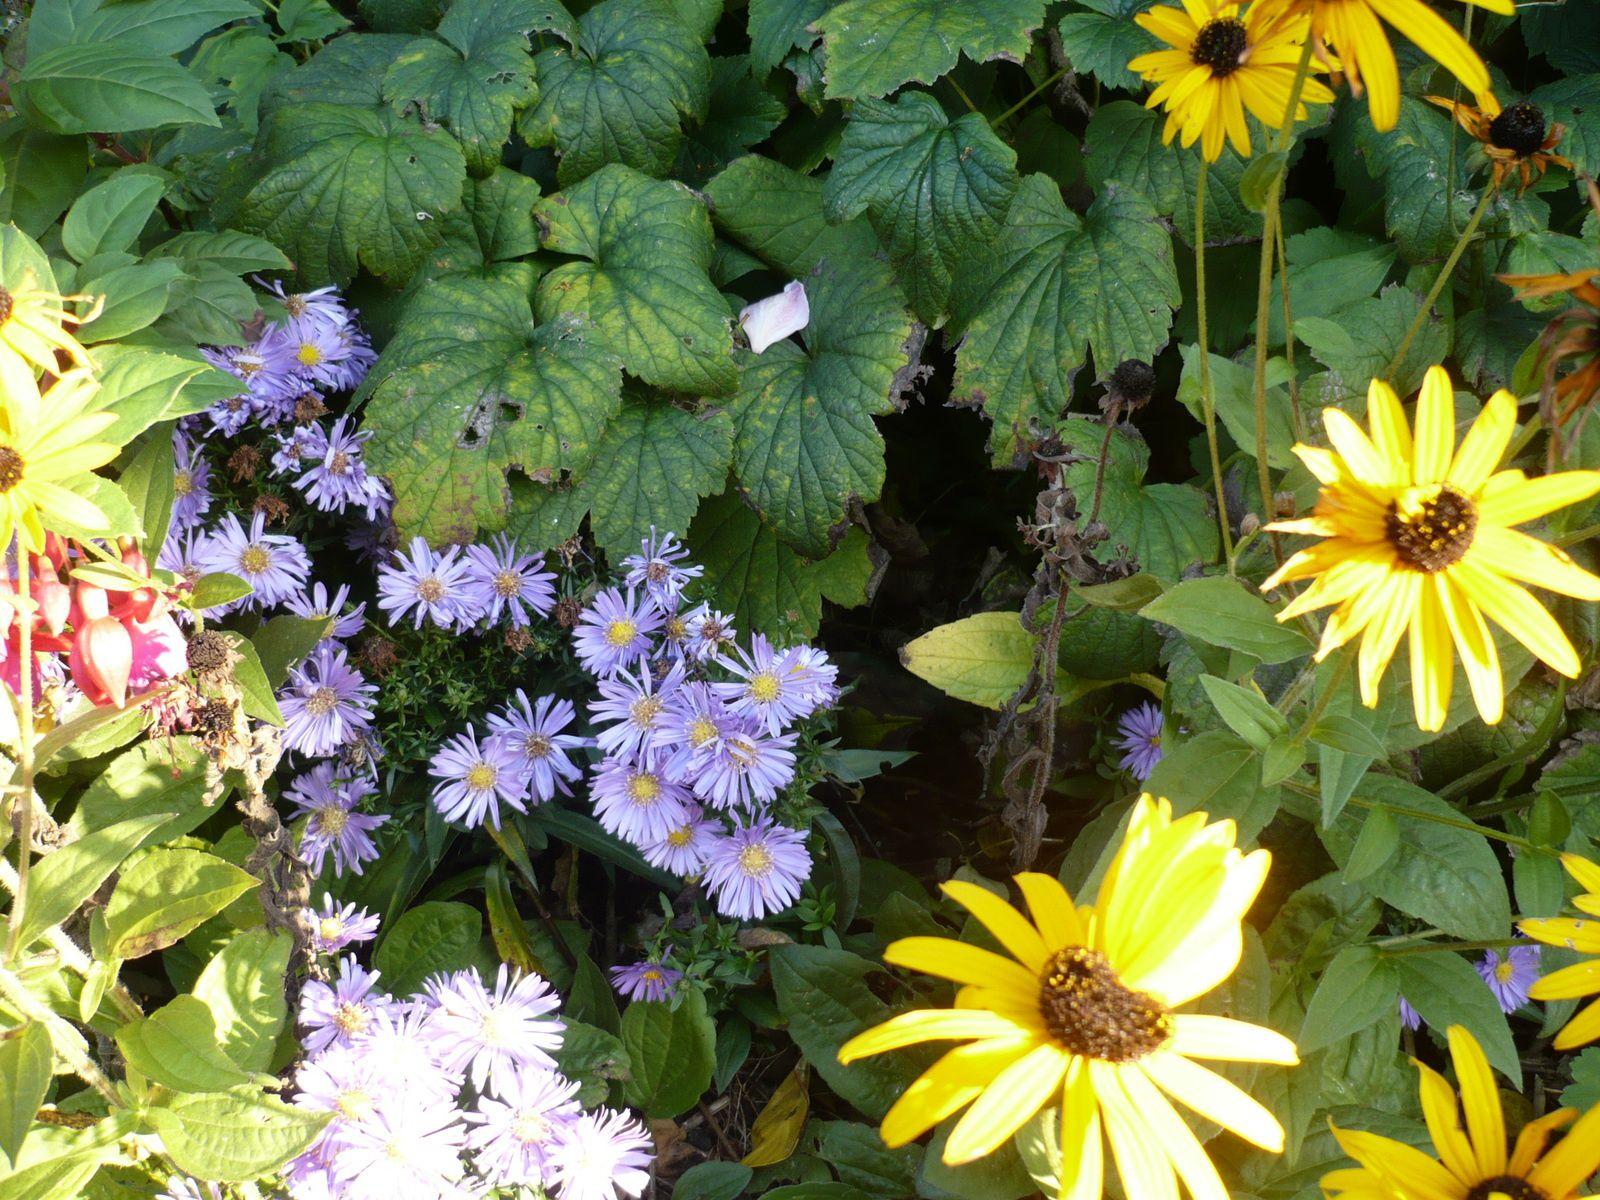 rudbeckia jaune, asters nains et fuschias